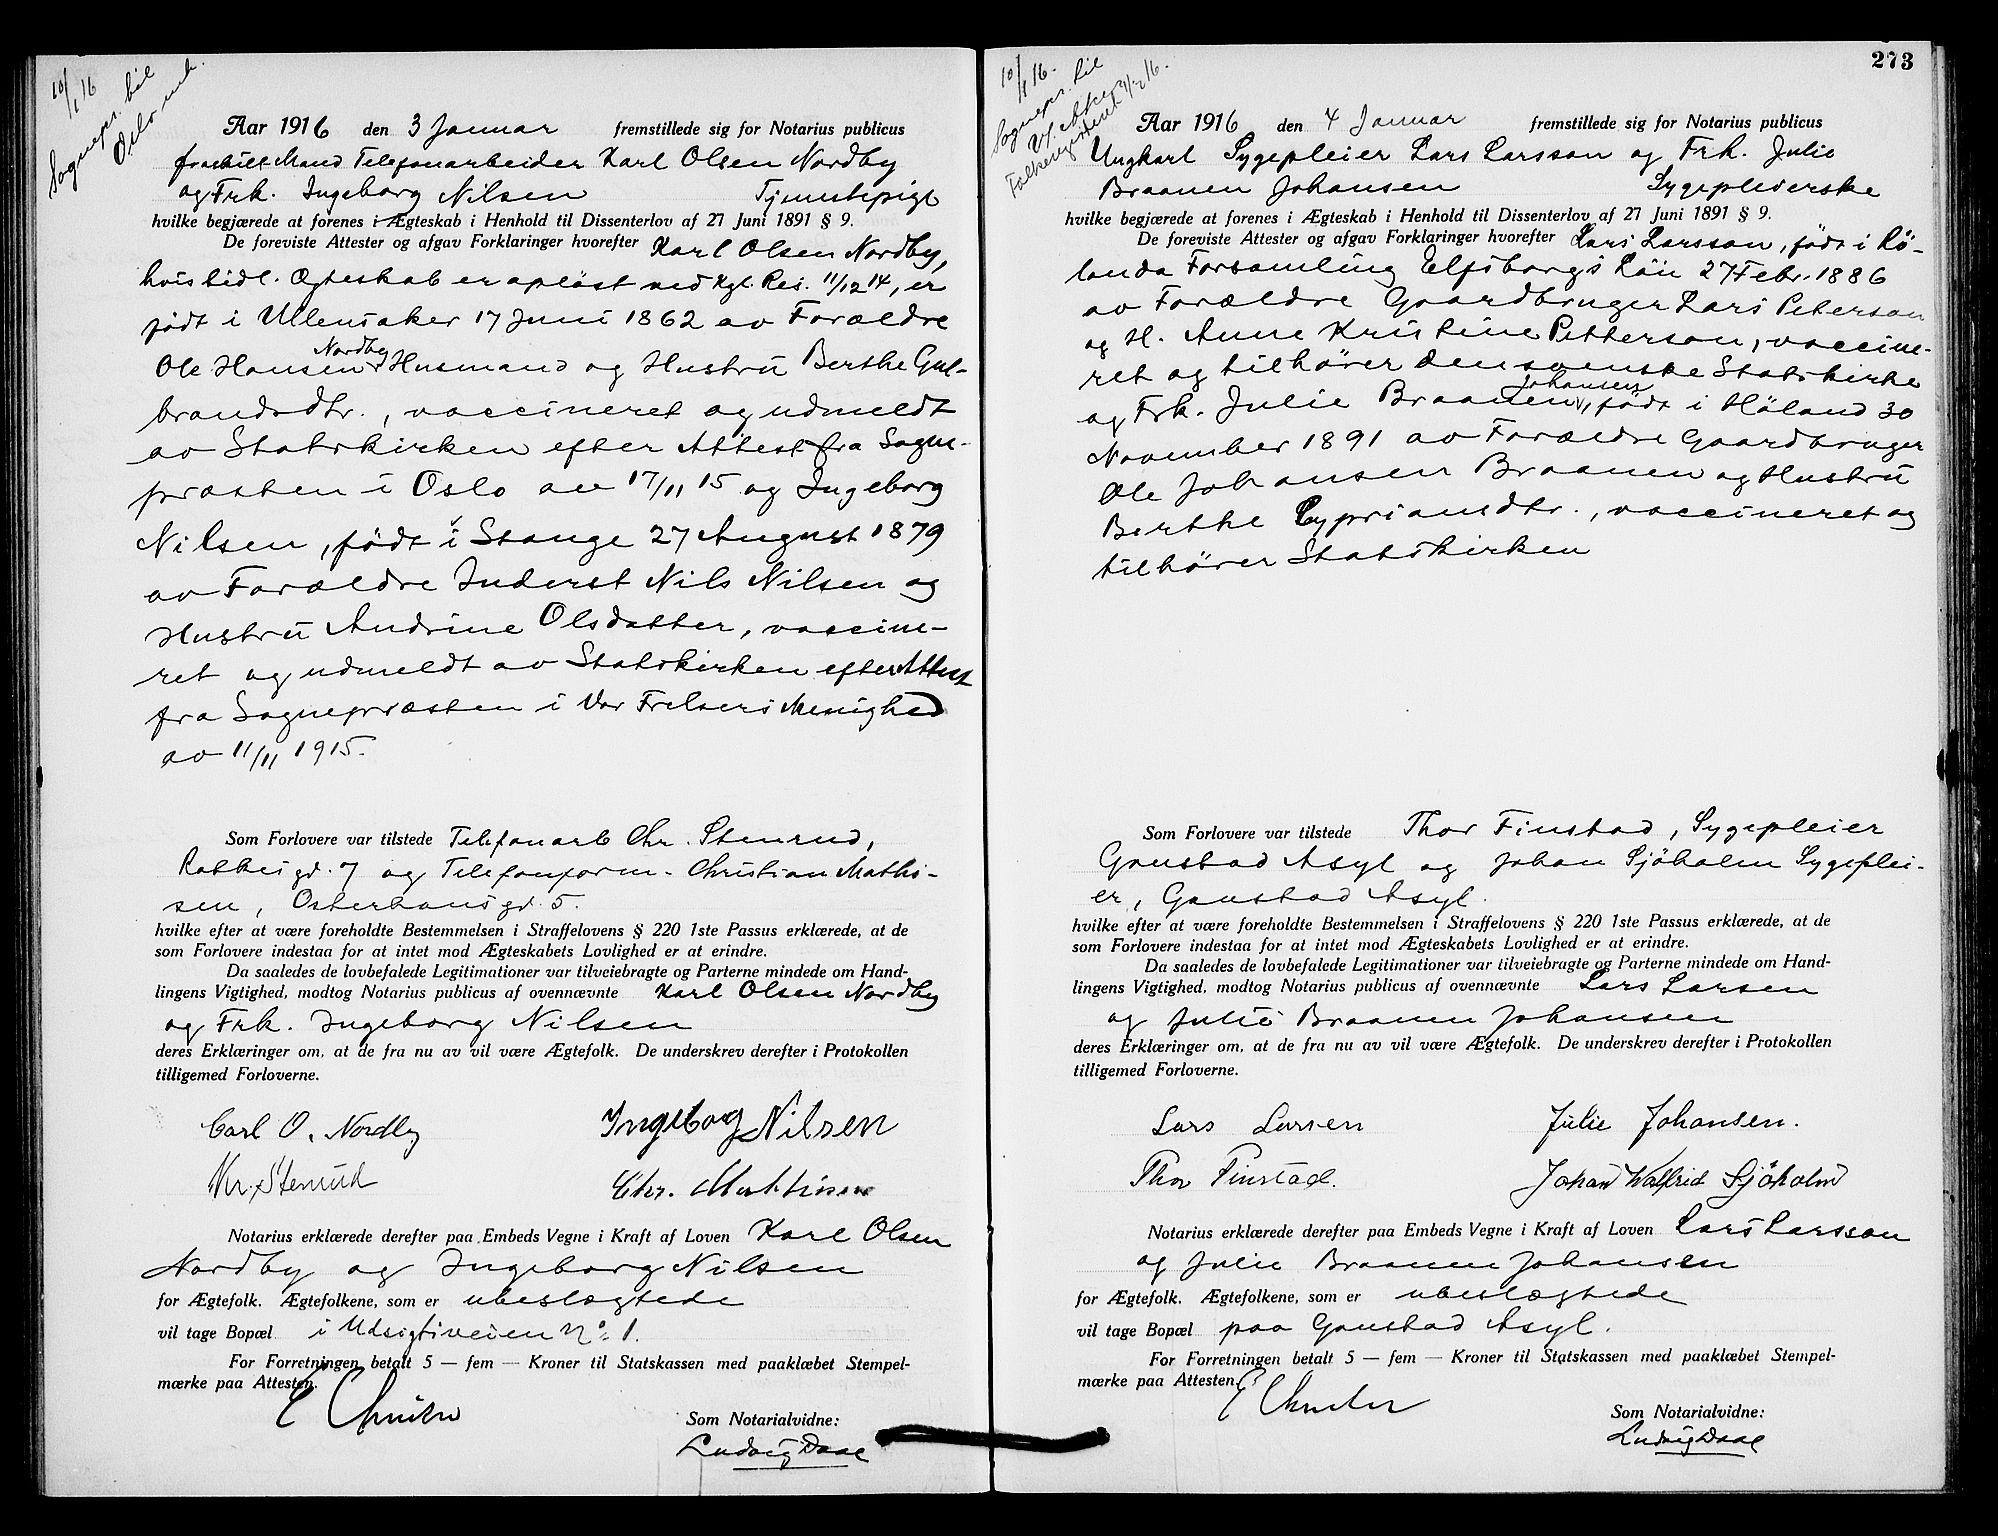 SAO, Oslo byfogd avd. I, L/Lb/Lbb/L0010: Notarialprotokoll, rekke II: Vigsler, 1914-1916, s. 272b-273a